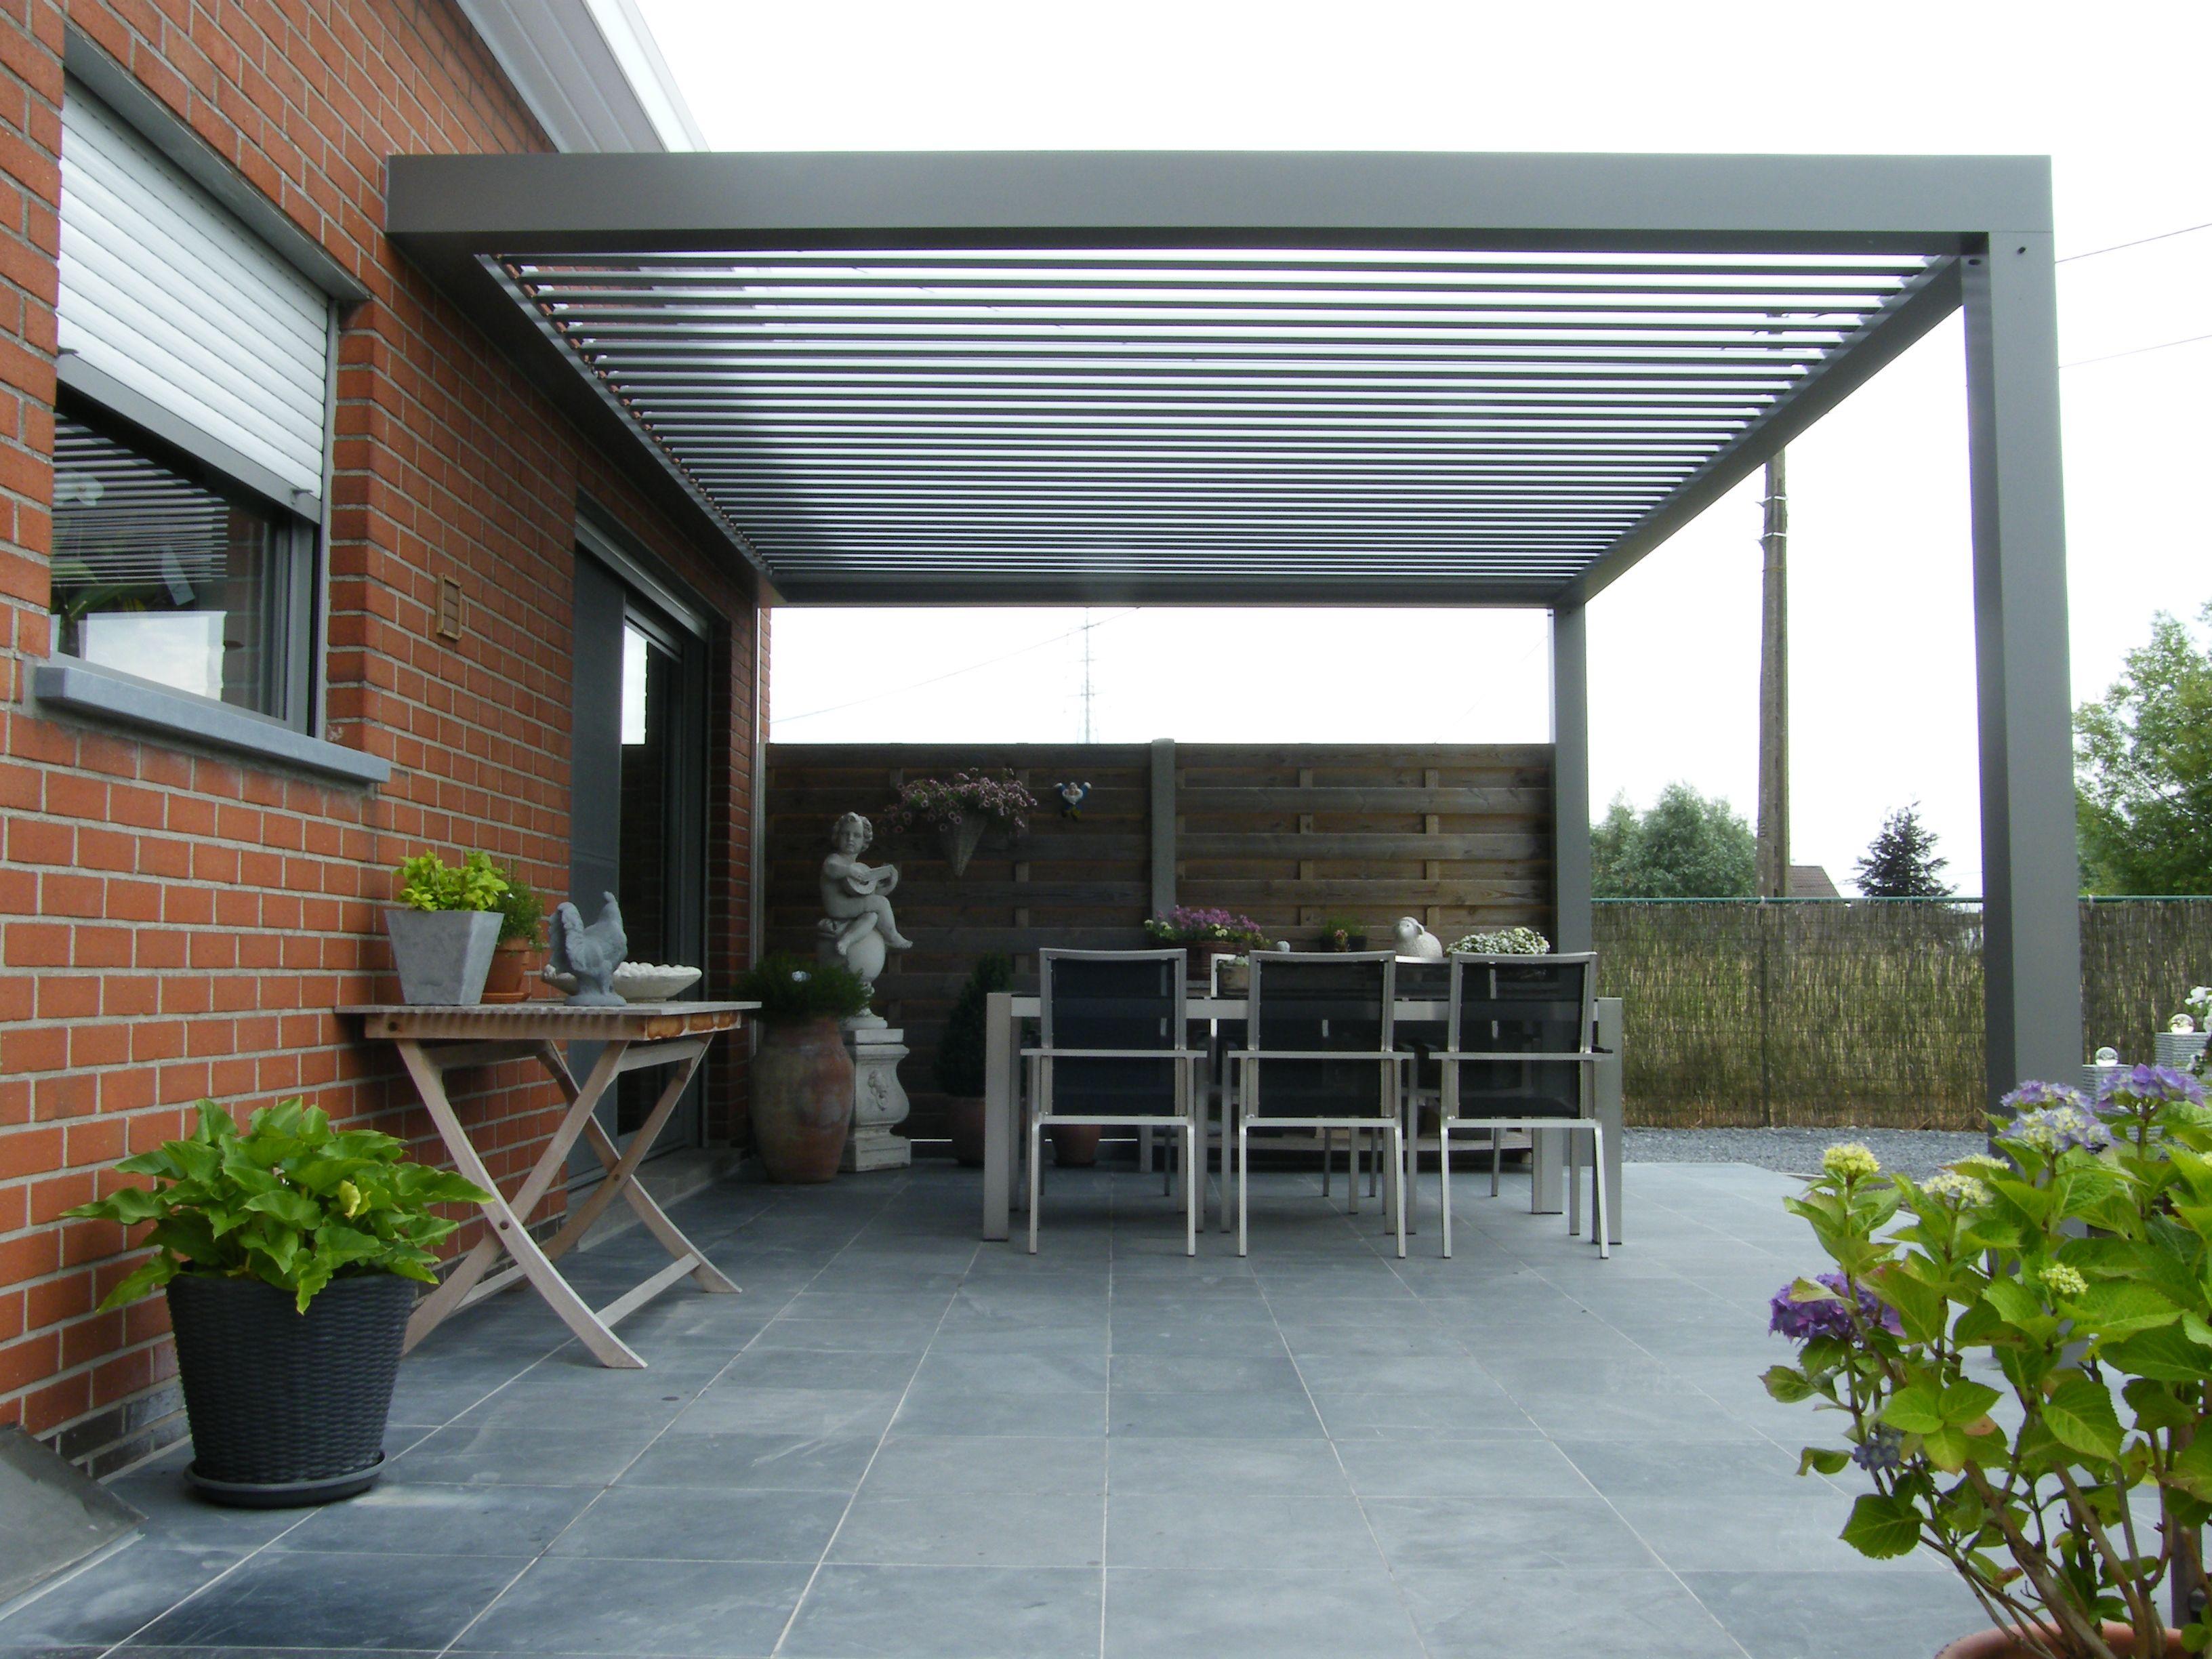 biossun terrasoverkapping pergola couverture de terrasse biossun pergola pinterest pergola. Black Bedroom Furniture Sets. Home Design Ideas